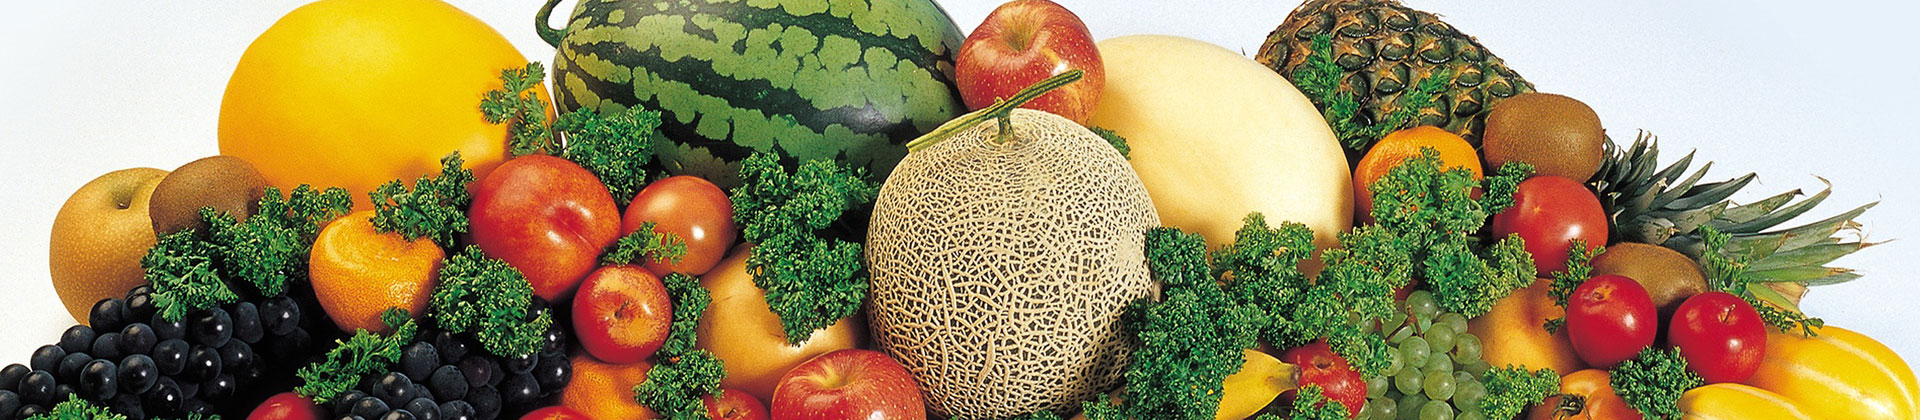 balboa-slider-produce